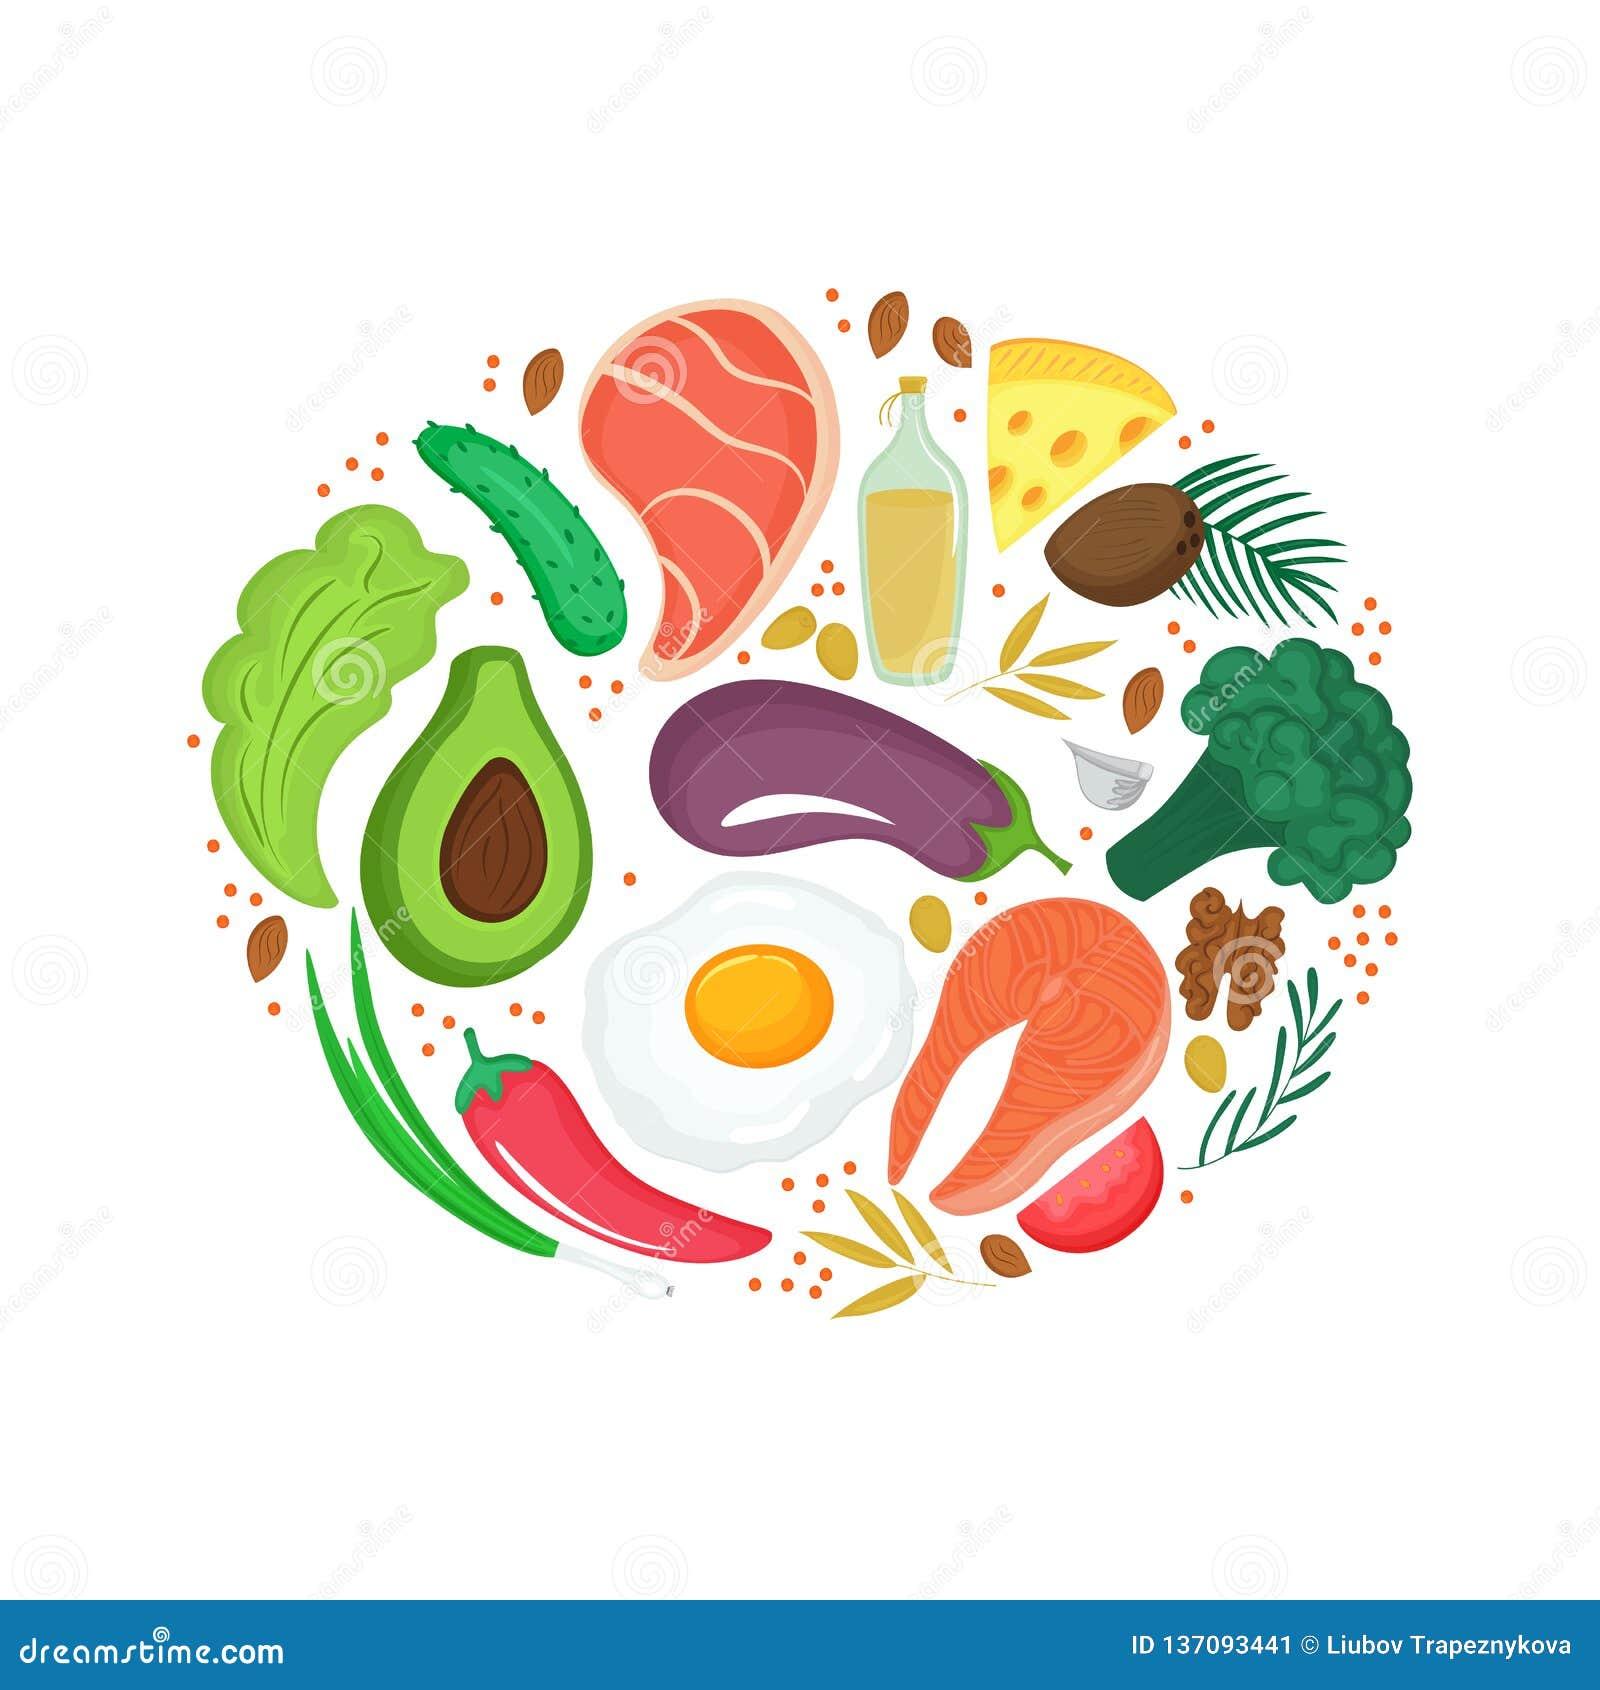 Keto διατροφή Κετονογενετικό έμβλημα διατροφής με τα οργανικά λαχανικά, τα καρύδια και άλλα υγιή τρόφιμα Χαμηλό να κάνει δίαιτα ε